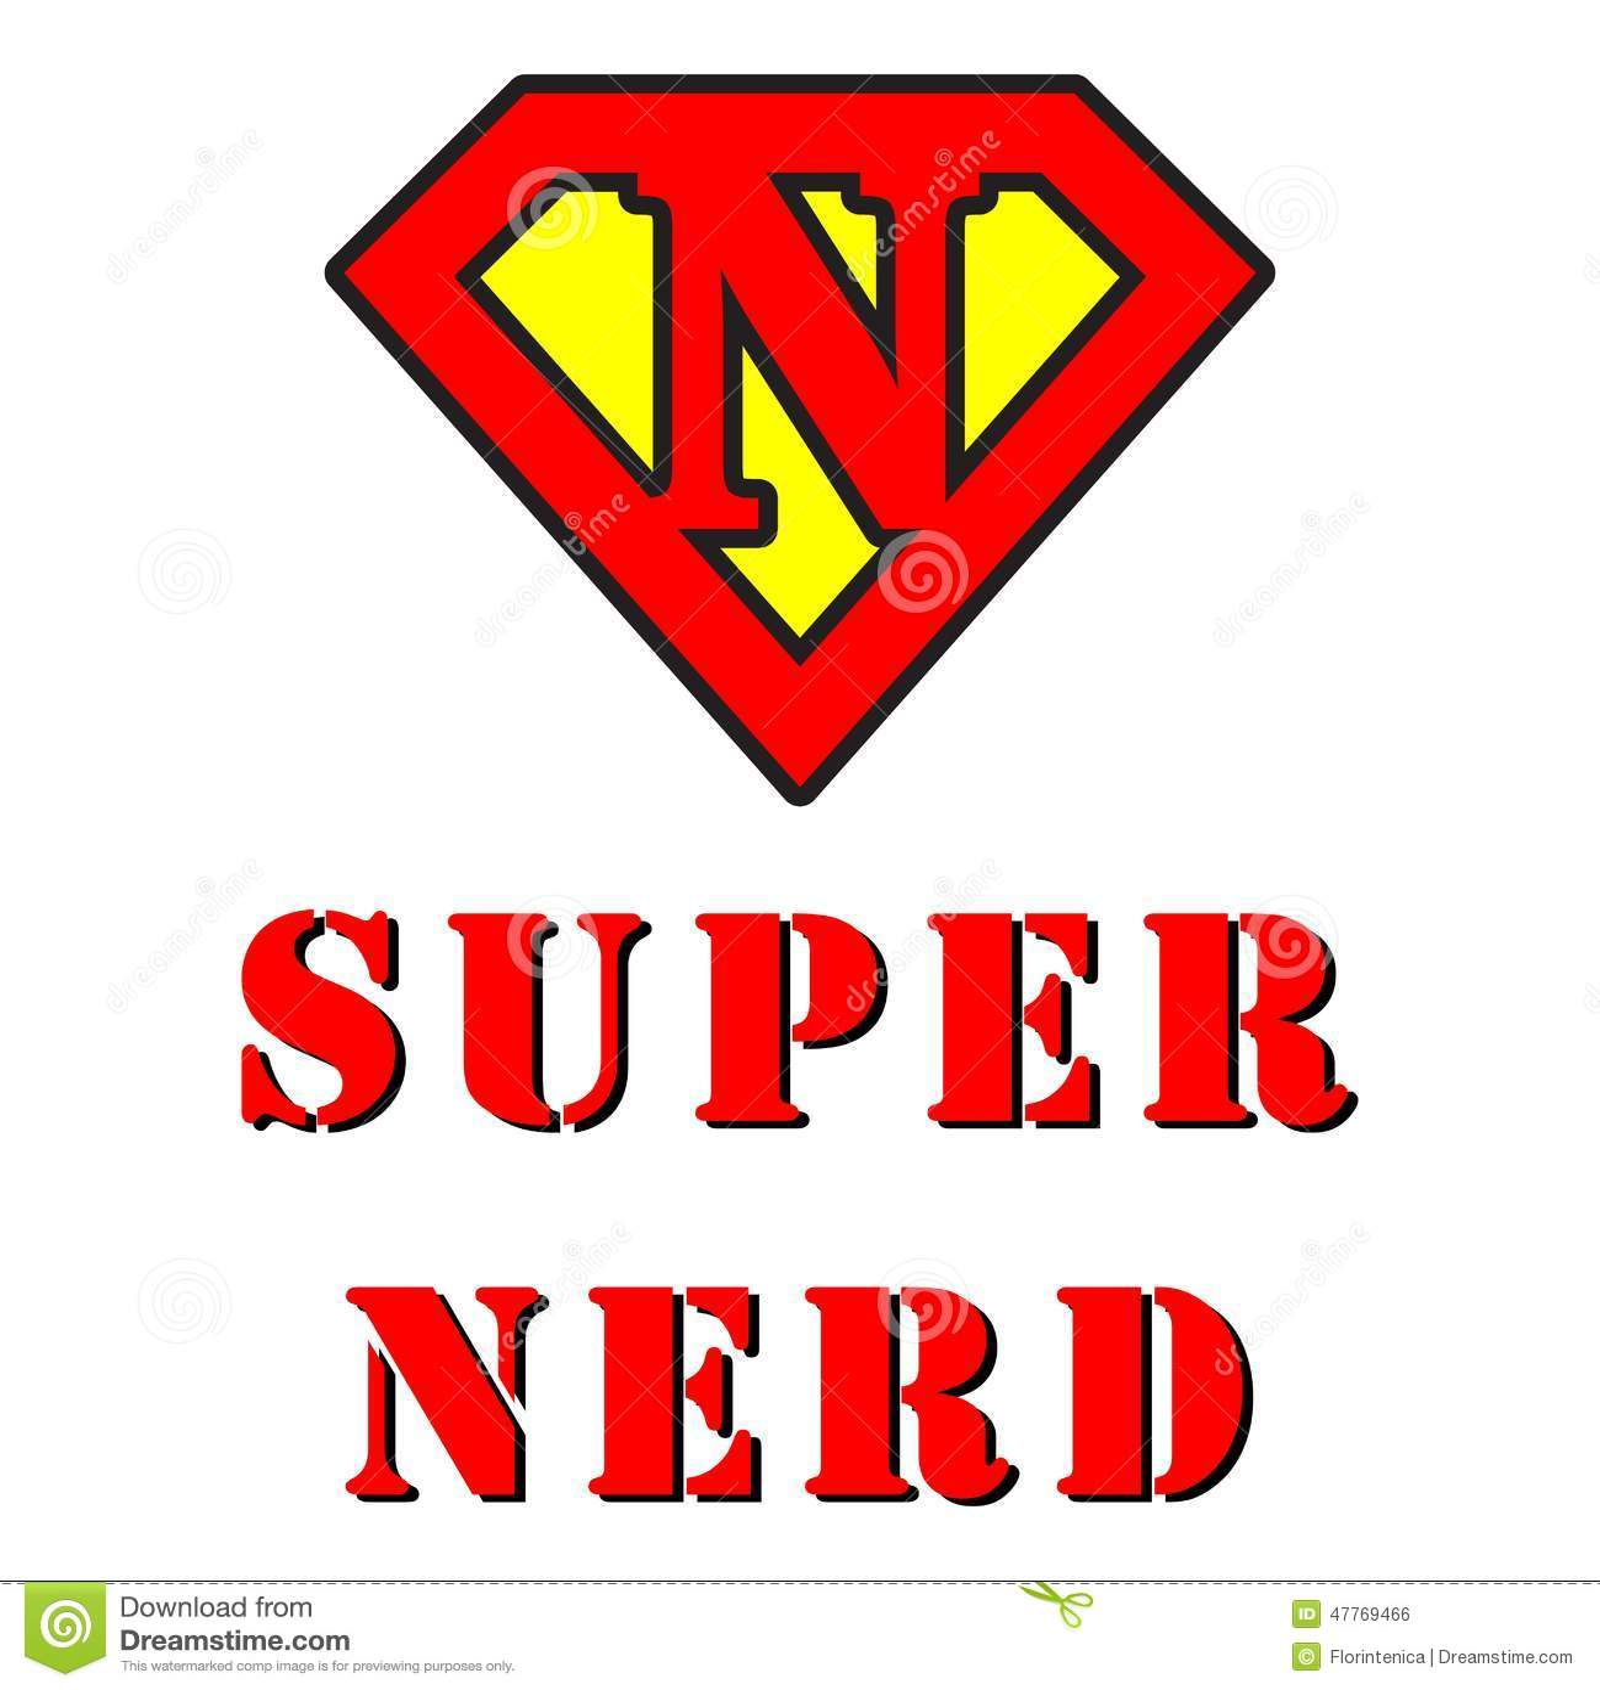 super nerd stock illustration image of logo  inside superman logo with different letters download customized superman logo with different letters